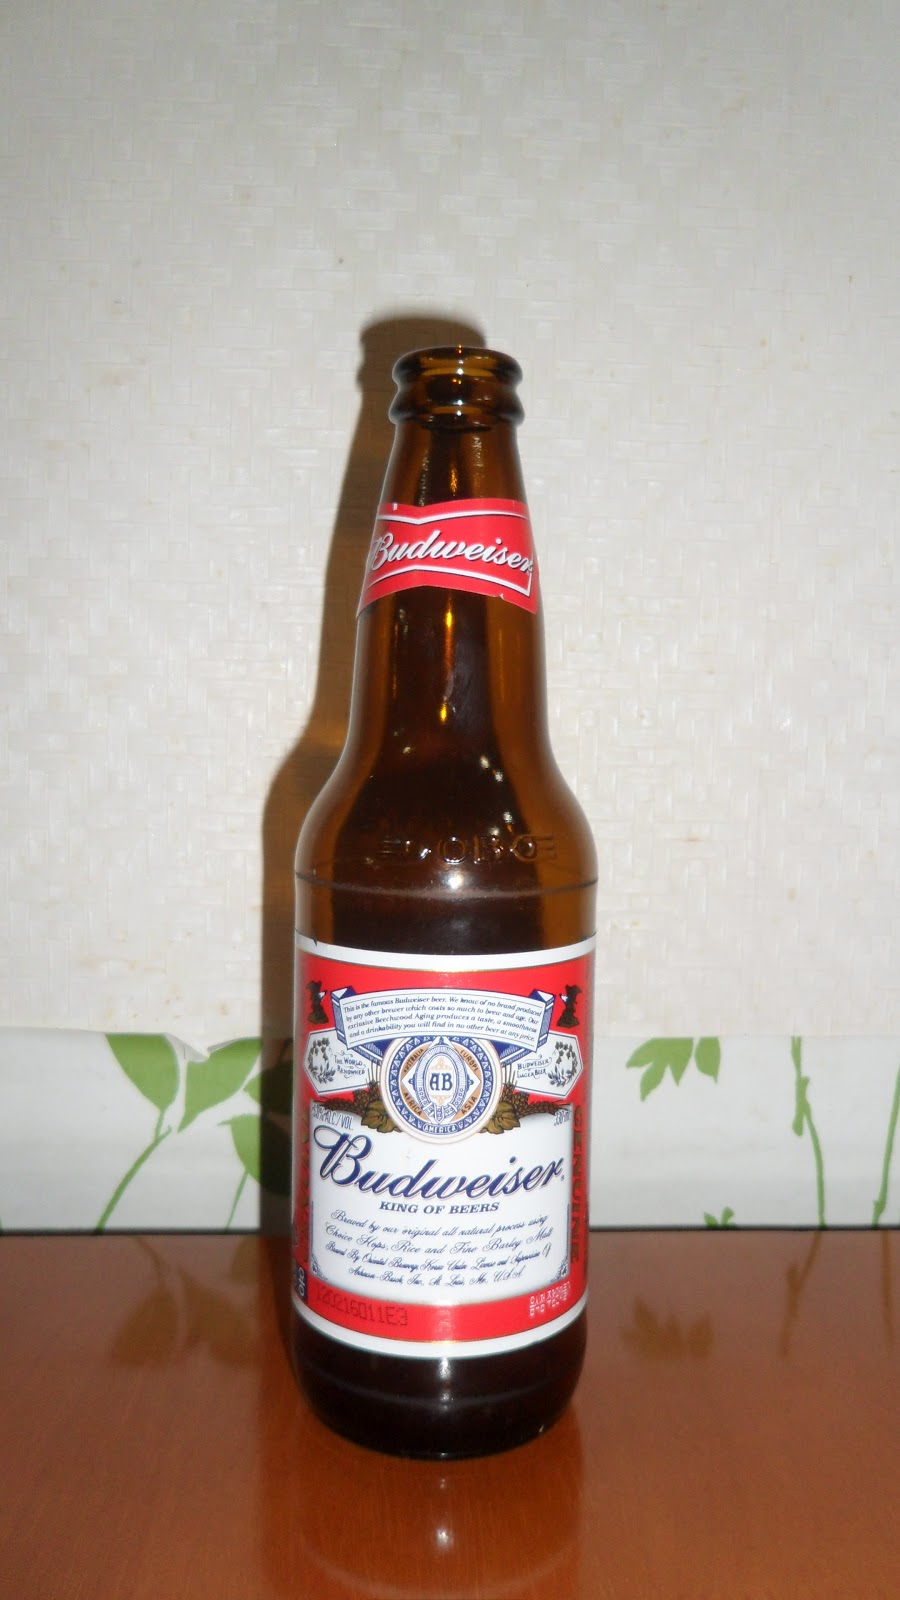 Gypsy Scholar: Budweiser: King of Beer